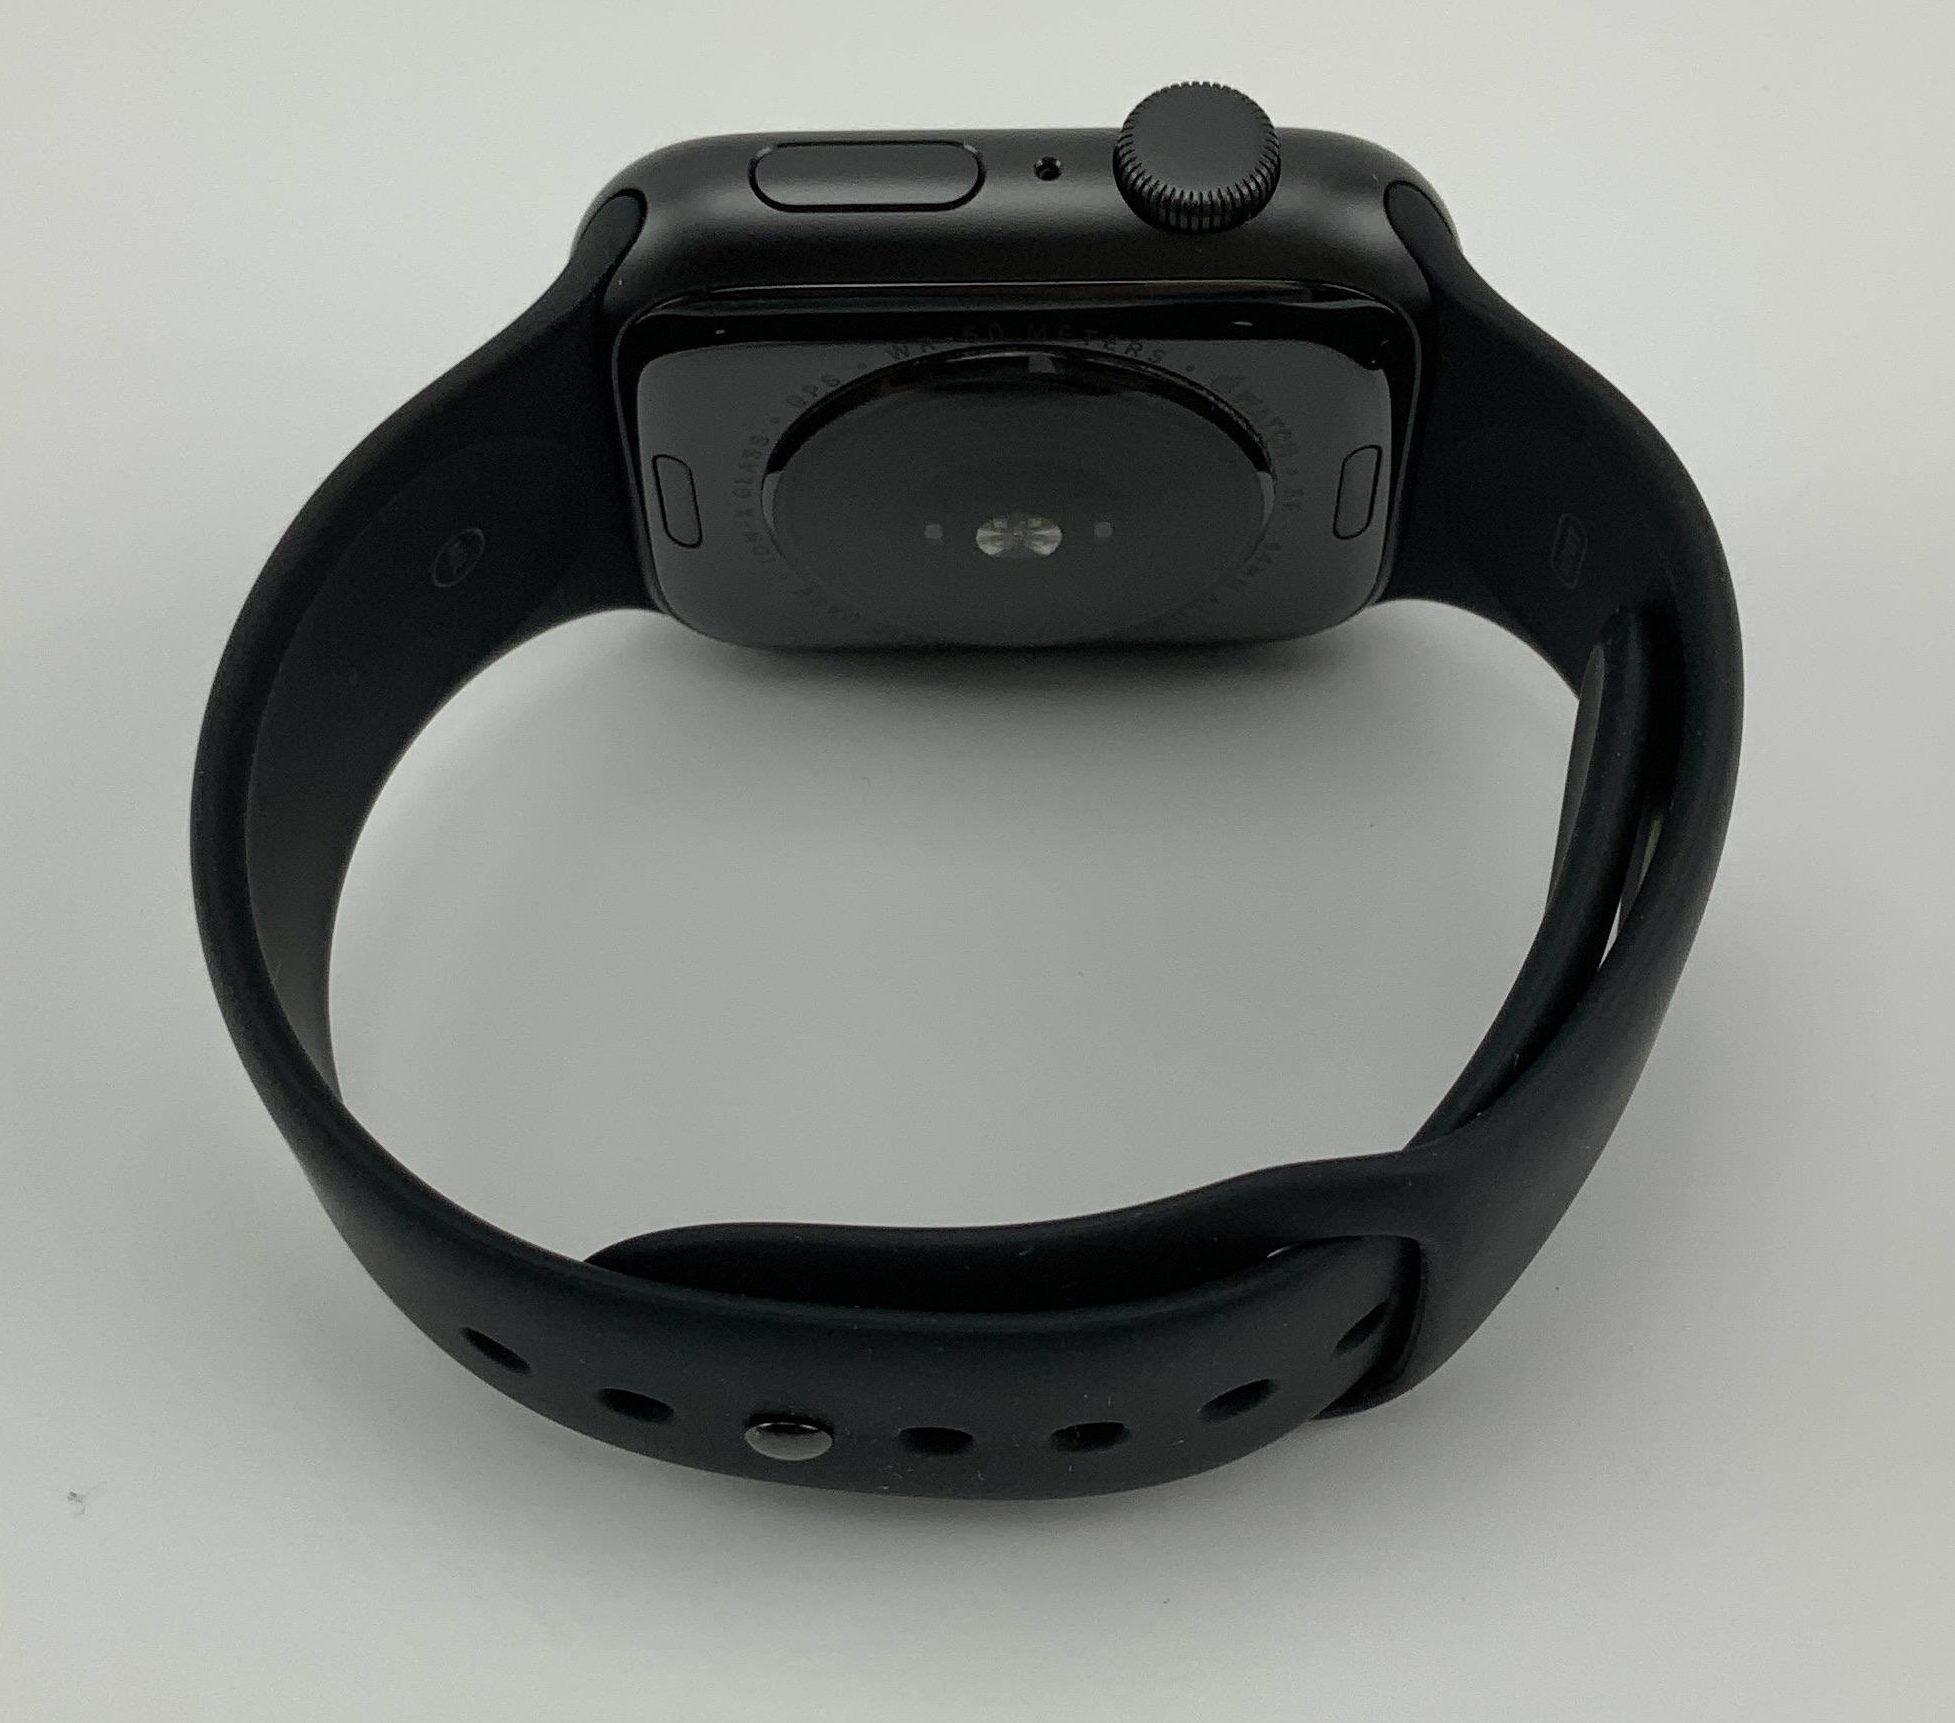 Watch SE (44mm), Space Gray, bild 3